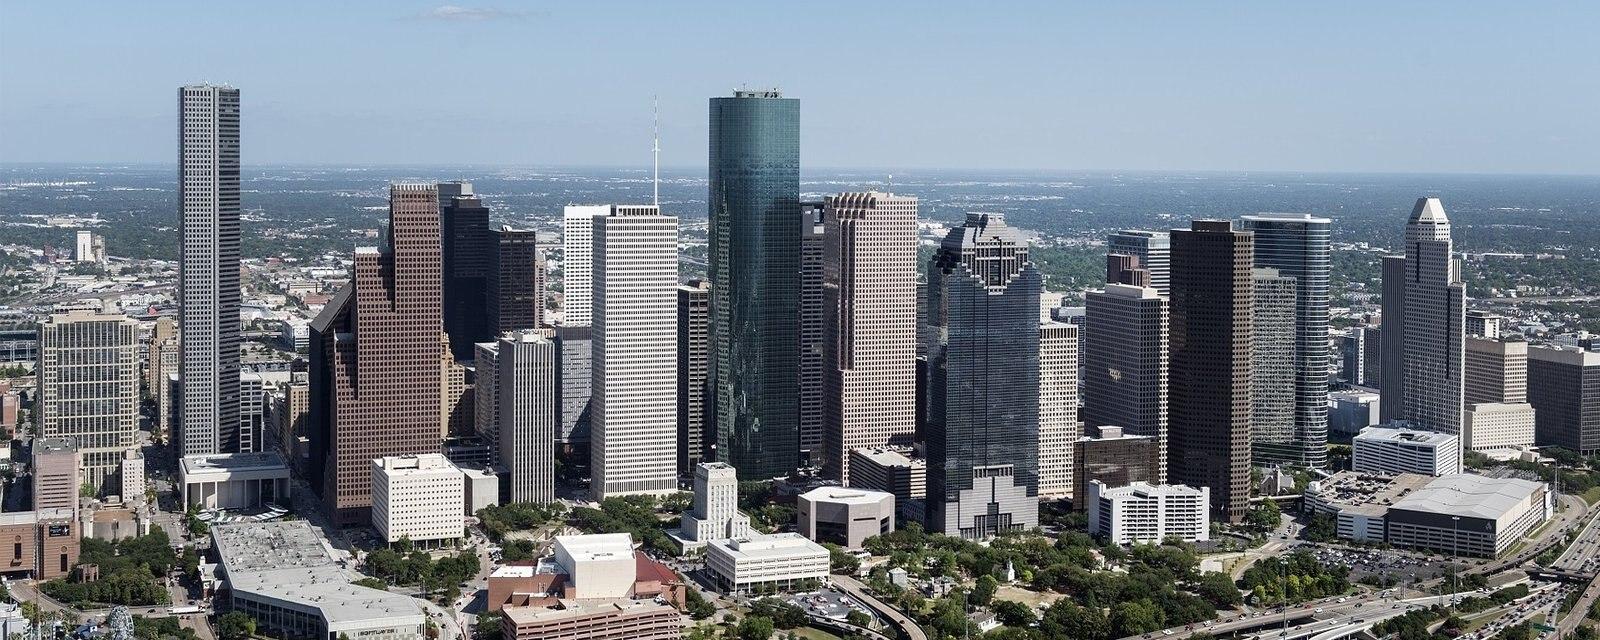 houston-skyline-harvey-estados-unidos-texas-bbva